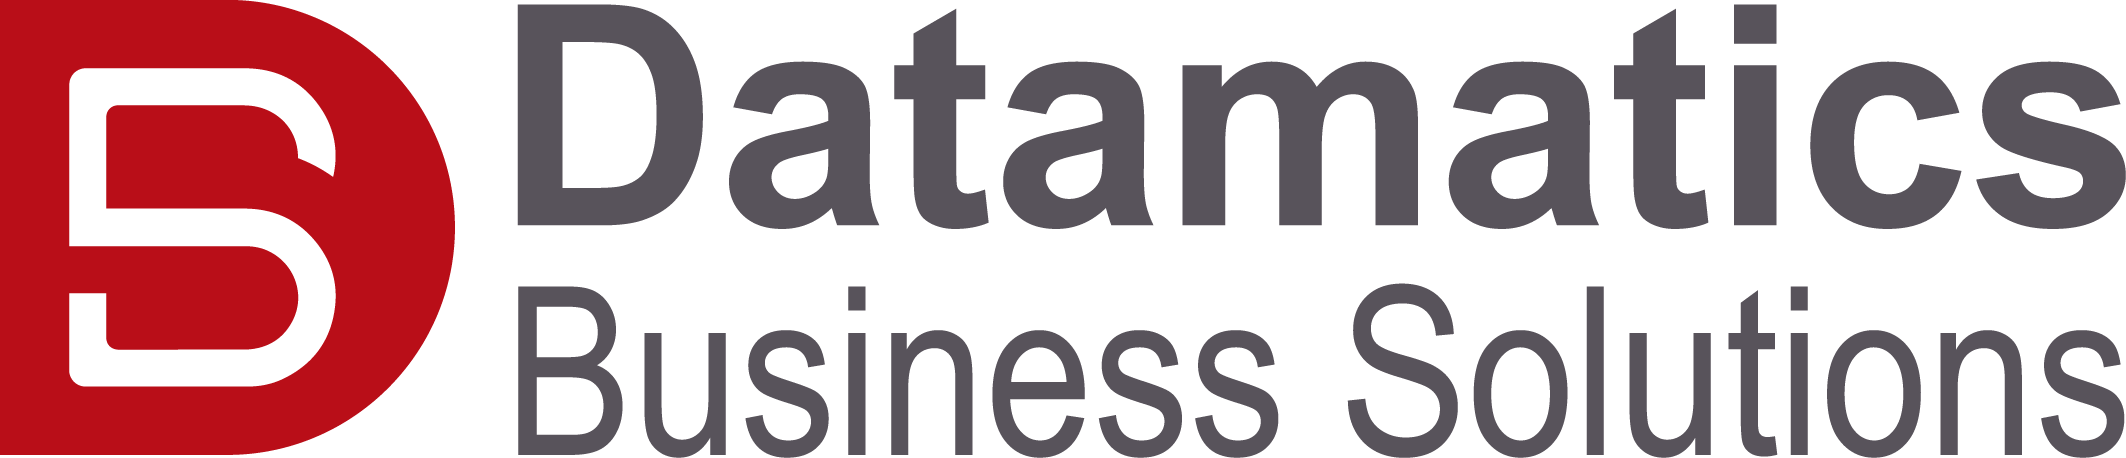 Datamatics Business Solutions Ltd. Logo